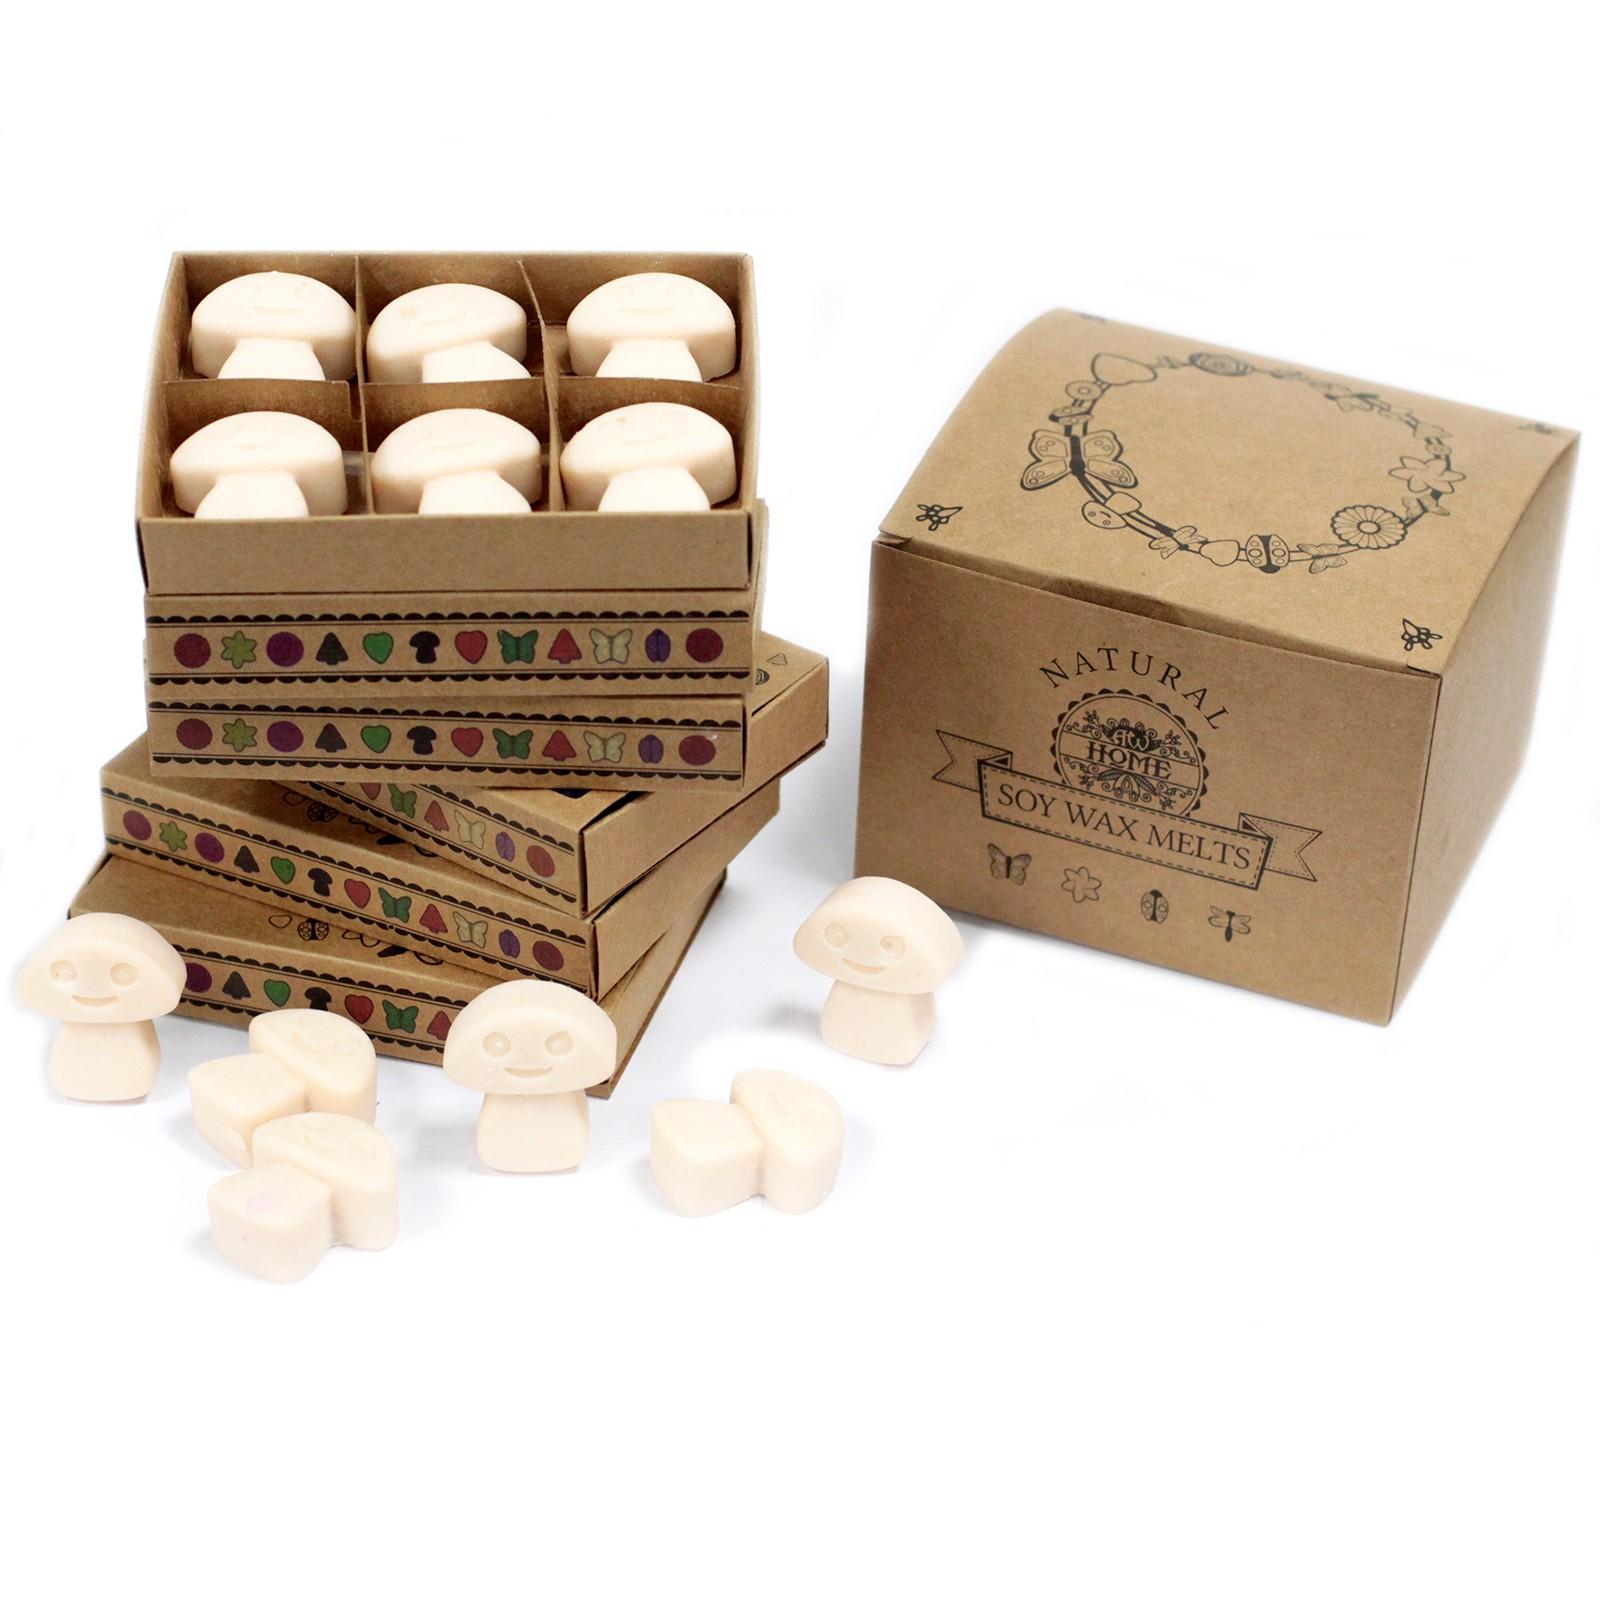 Box of 6 Wax Melts Vanilla Nutmeg